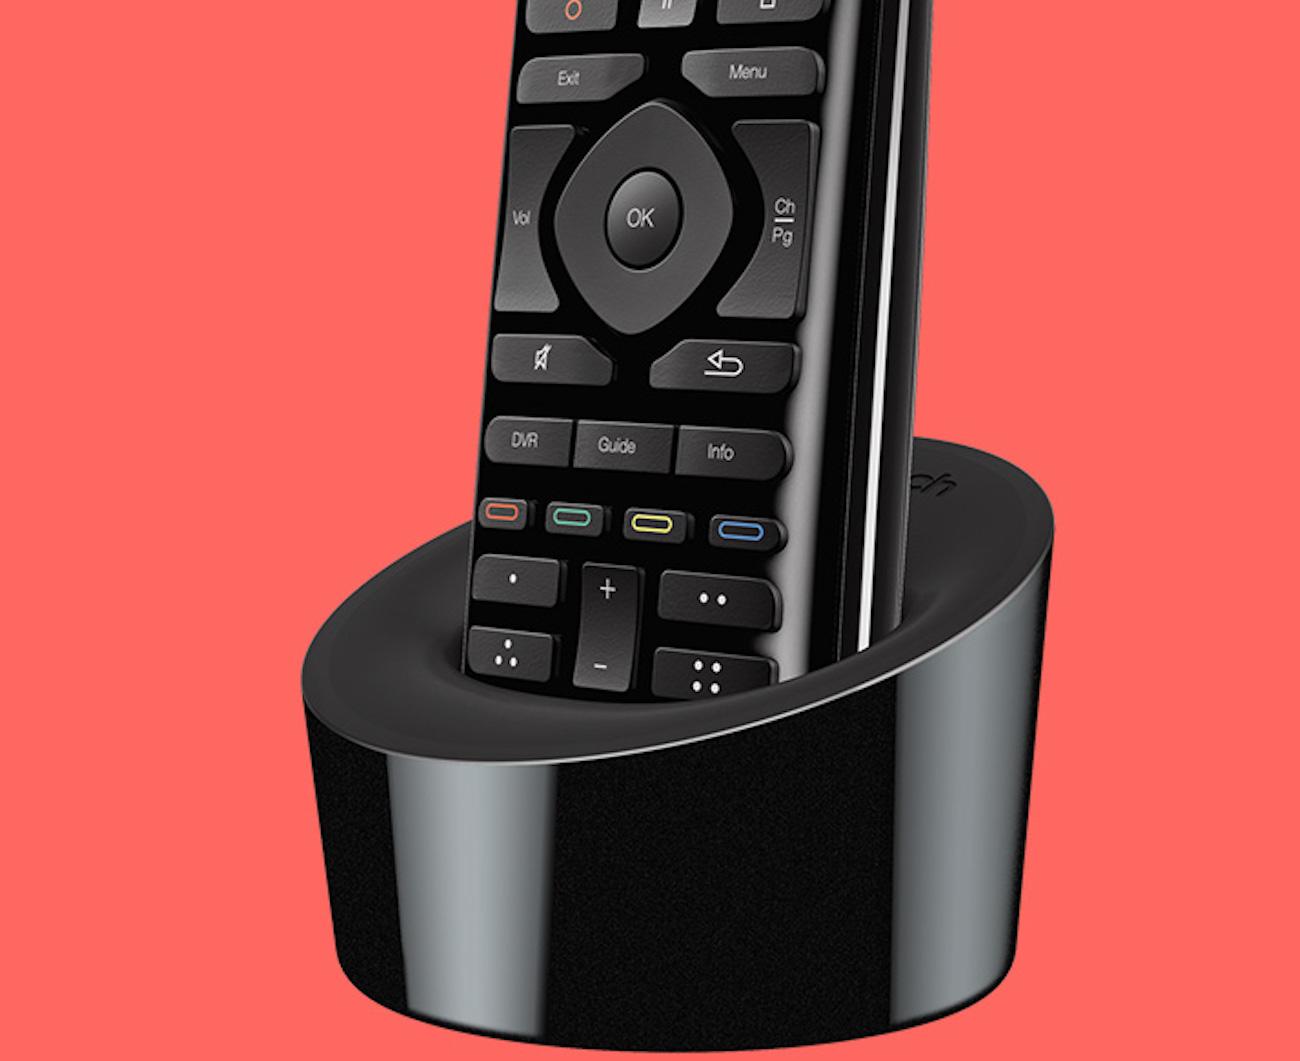 Logitech Harmony 950 Universal Remote controls all your media